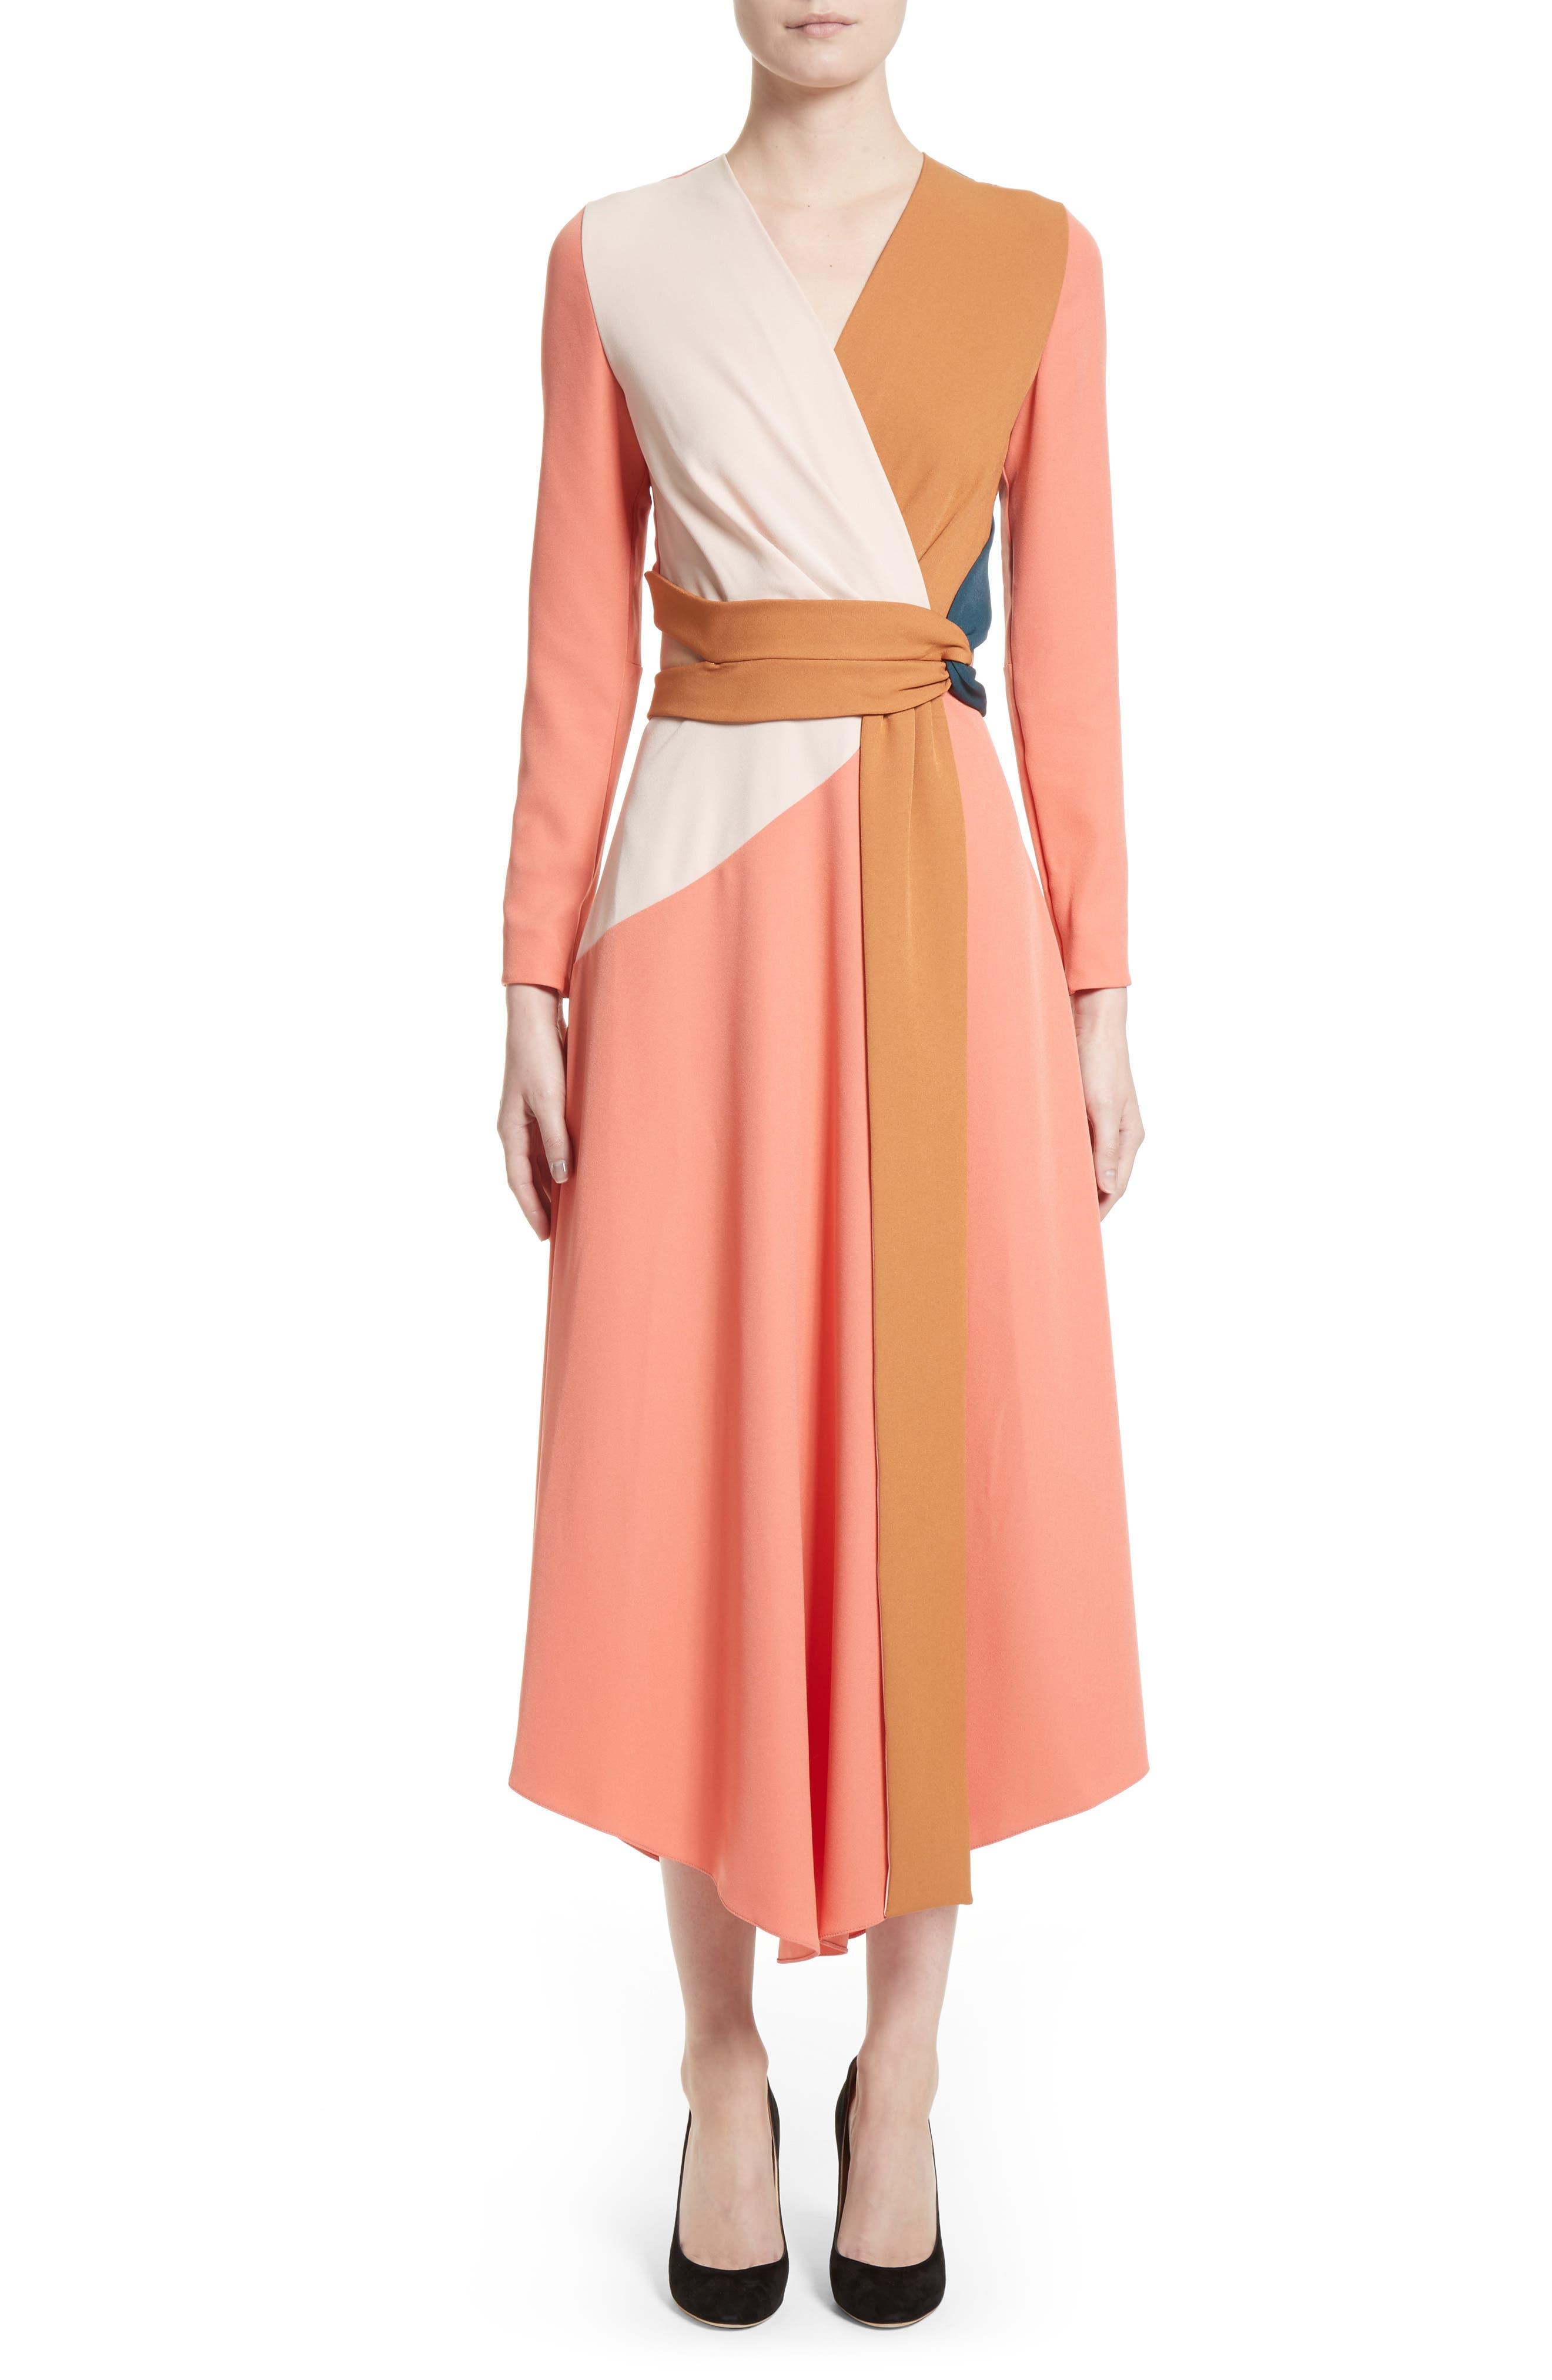 Himera Wrap Dress,                         Main,                         color, Apricot/ Blush/ Desert Sand